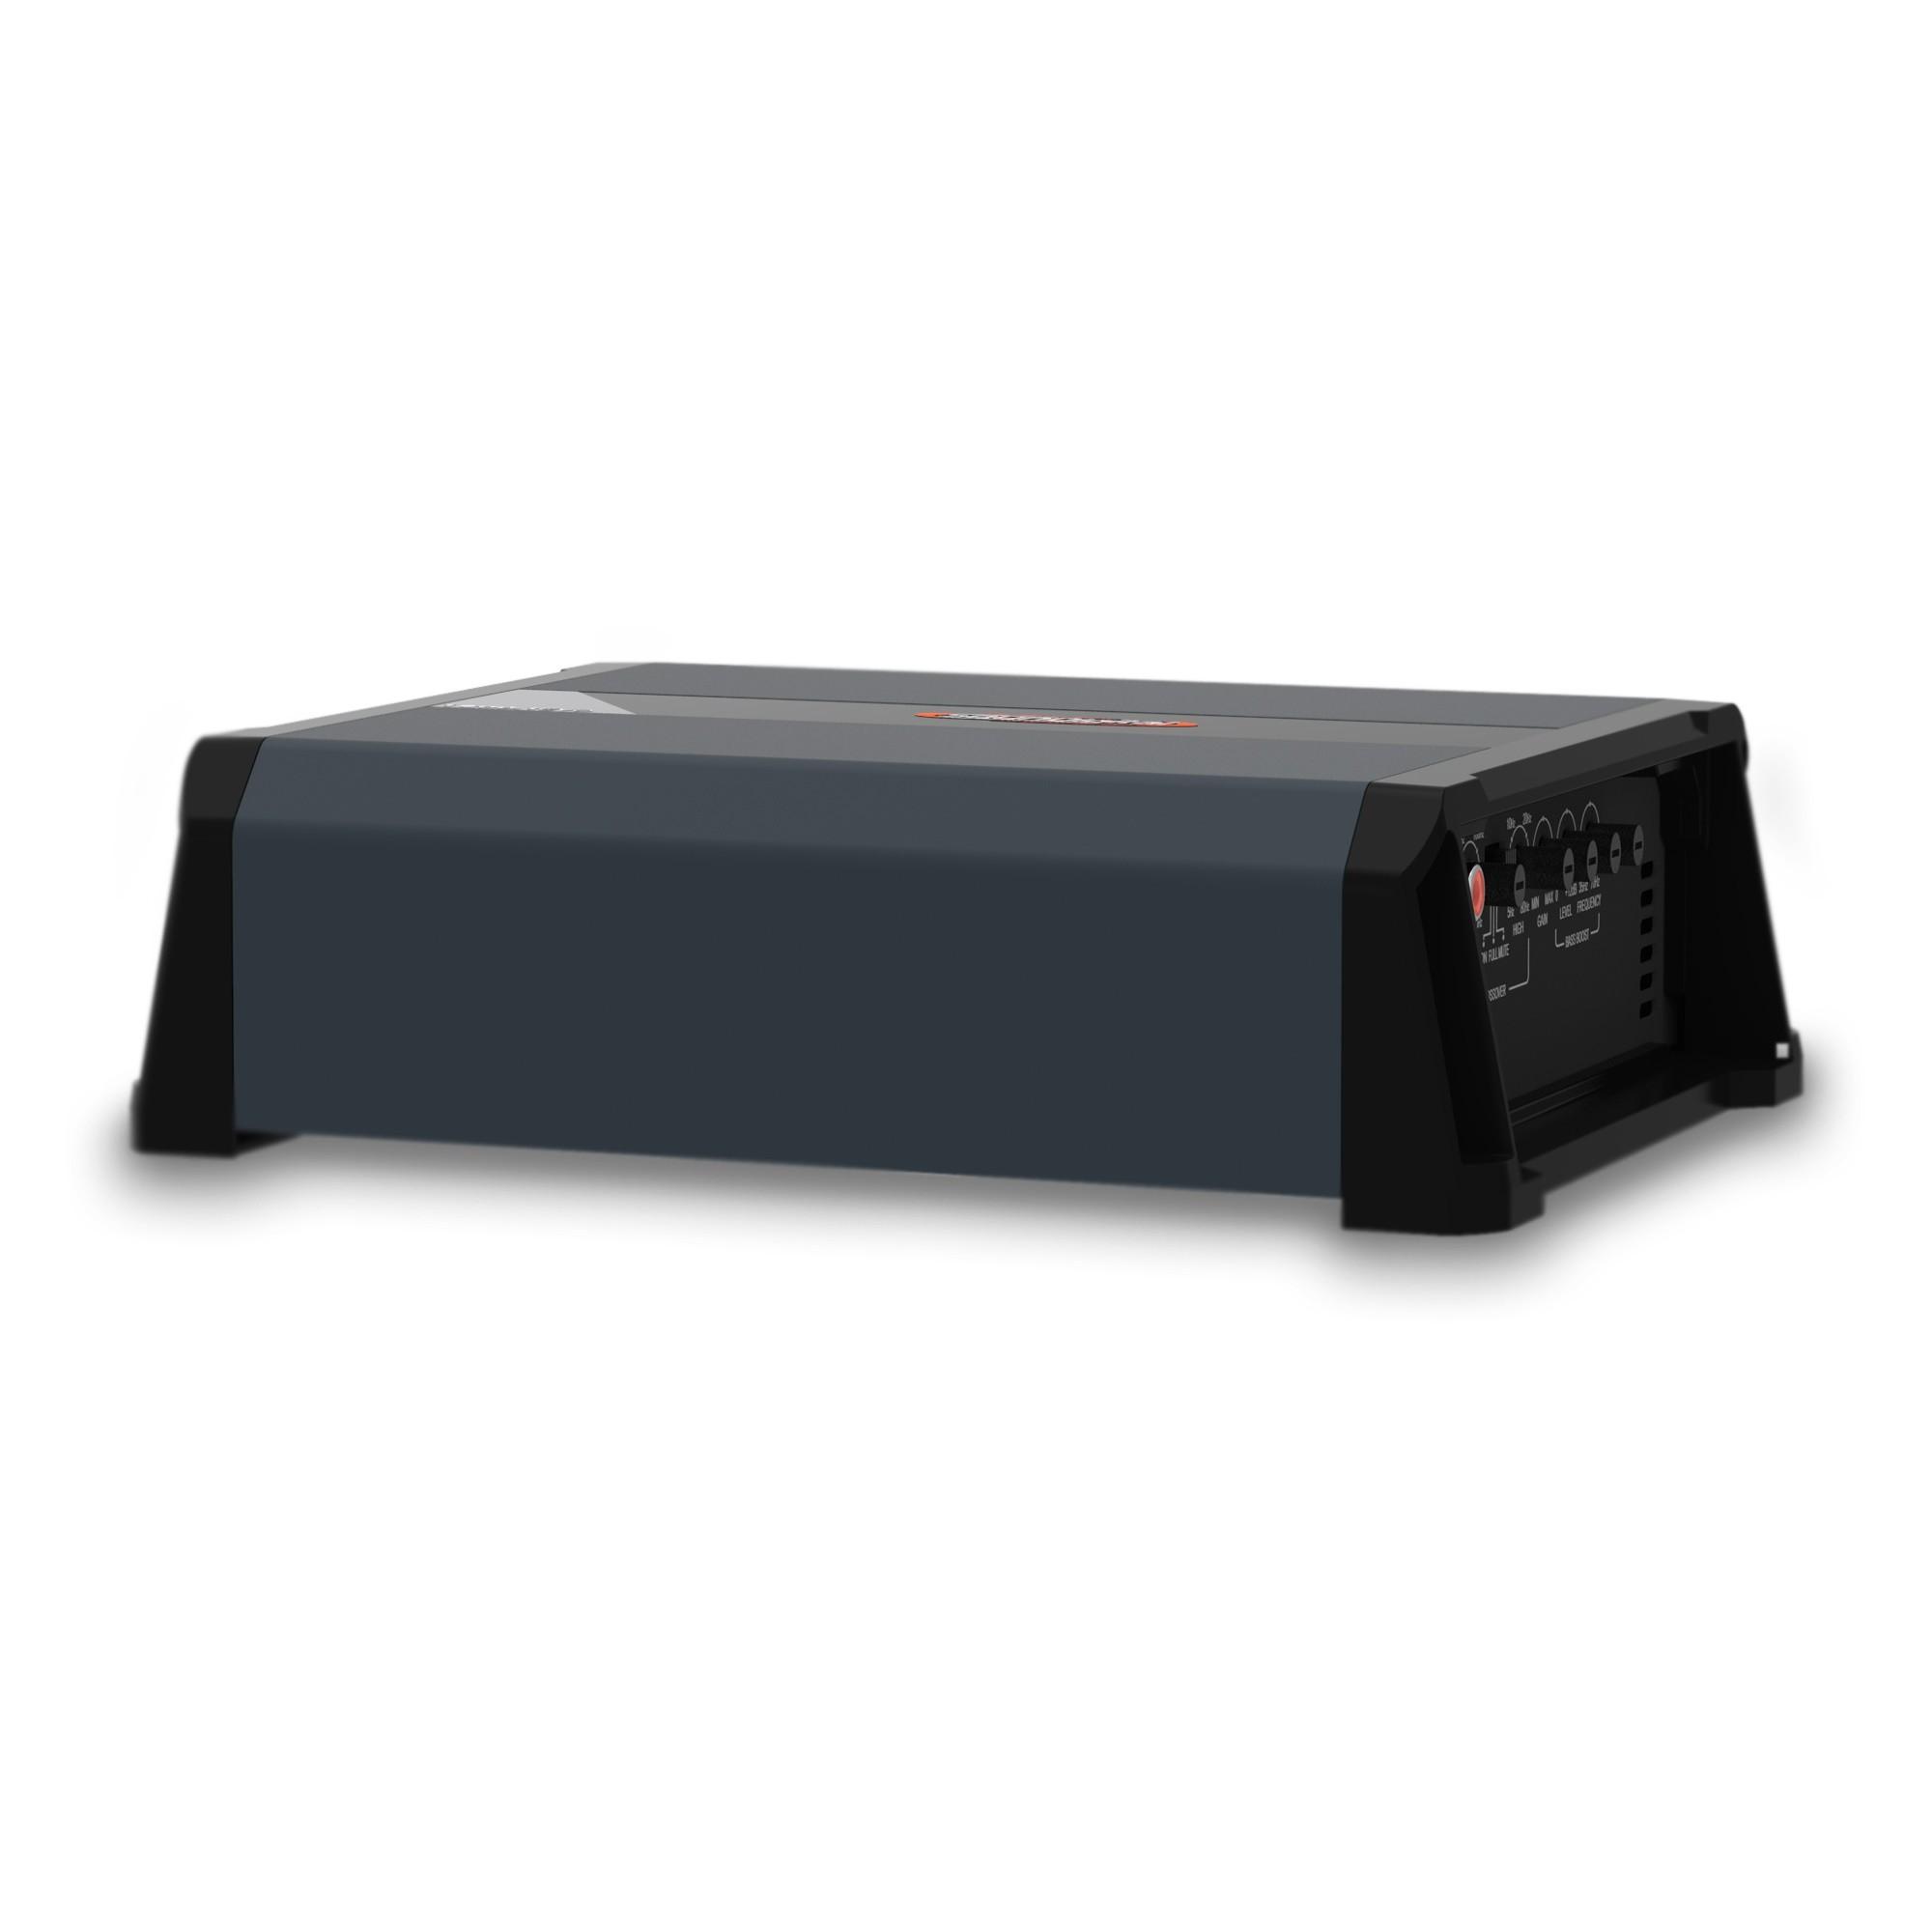 Módulo Amplificador Soundigital SD 1600.1 EVO 4.0 1600W Rms 1 Ohms 1 Canal